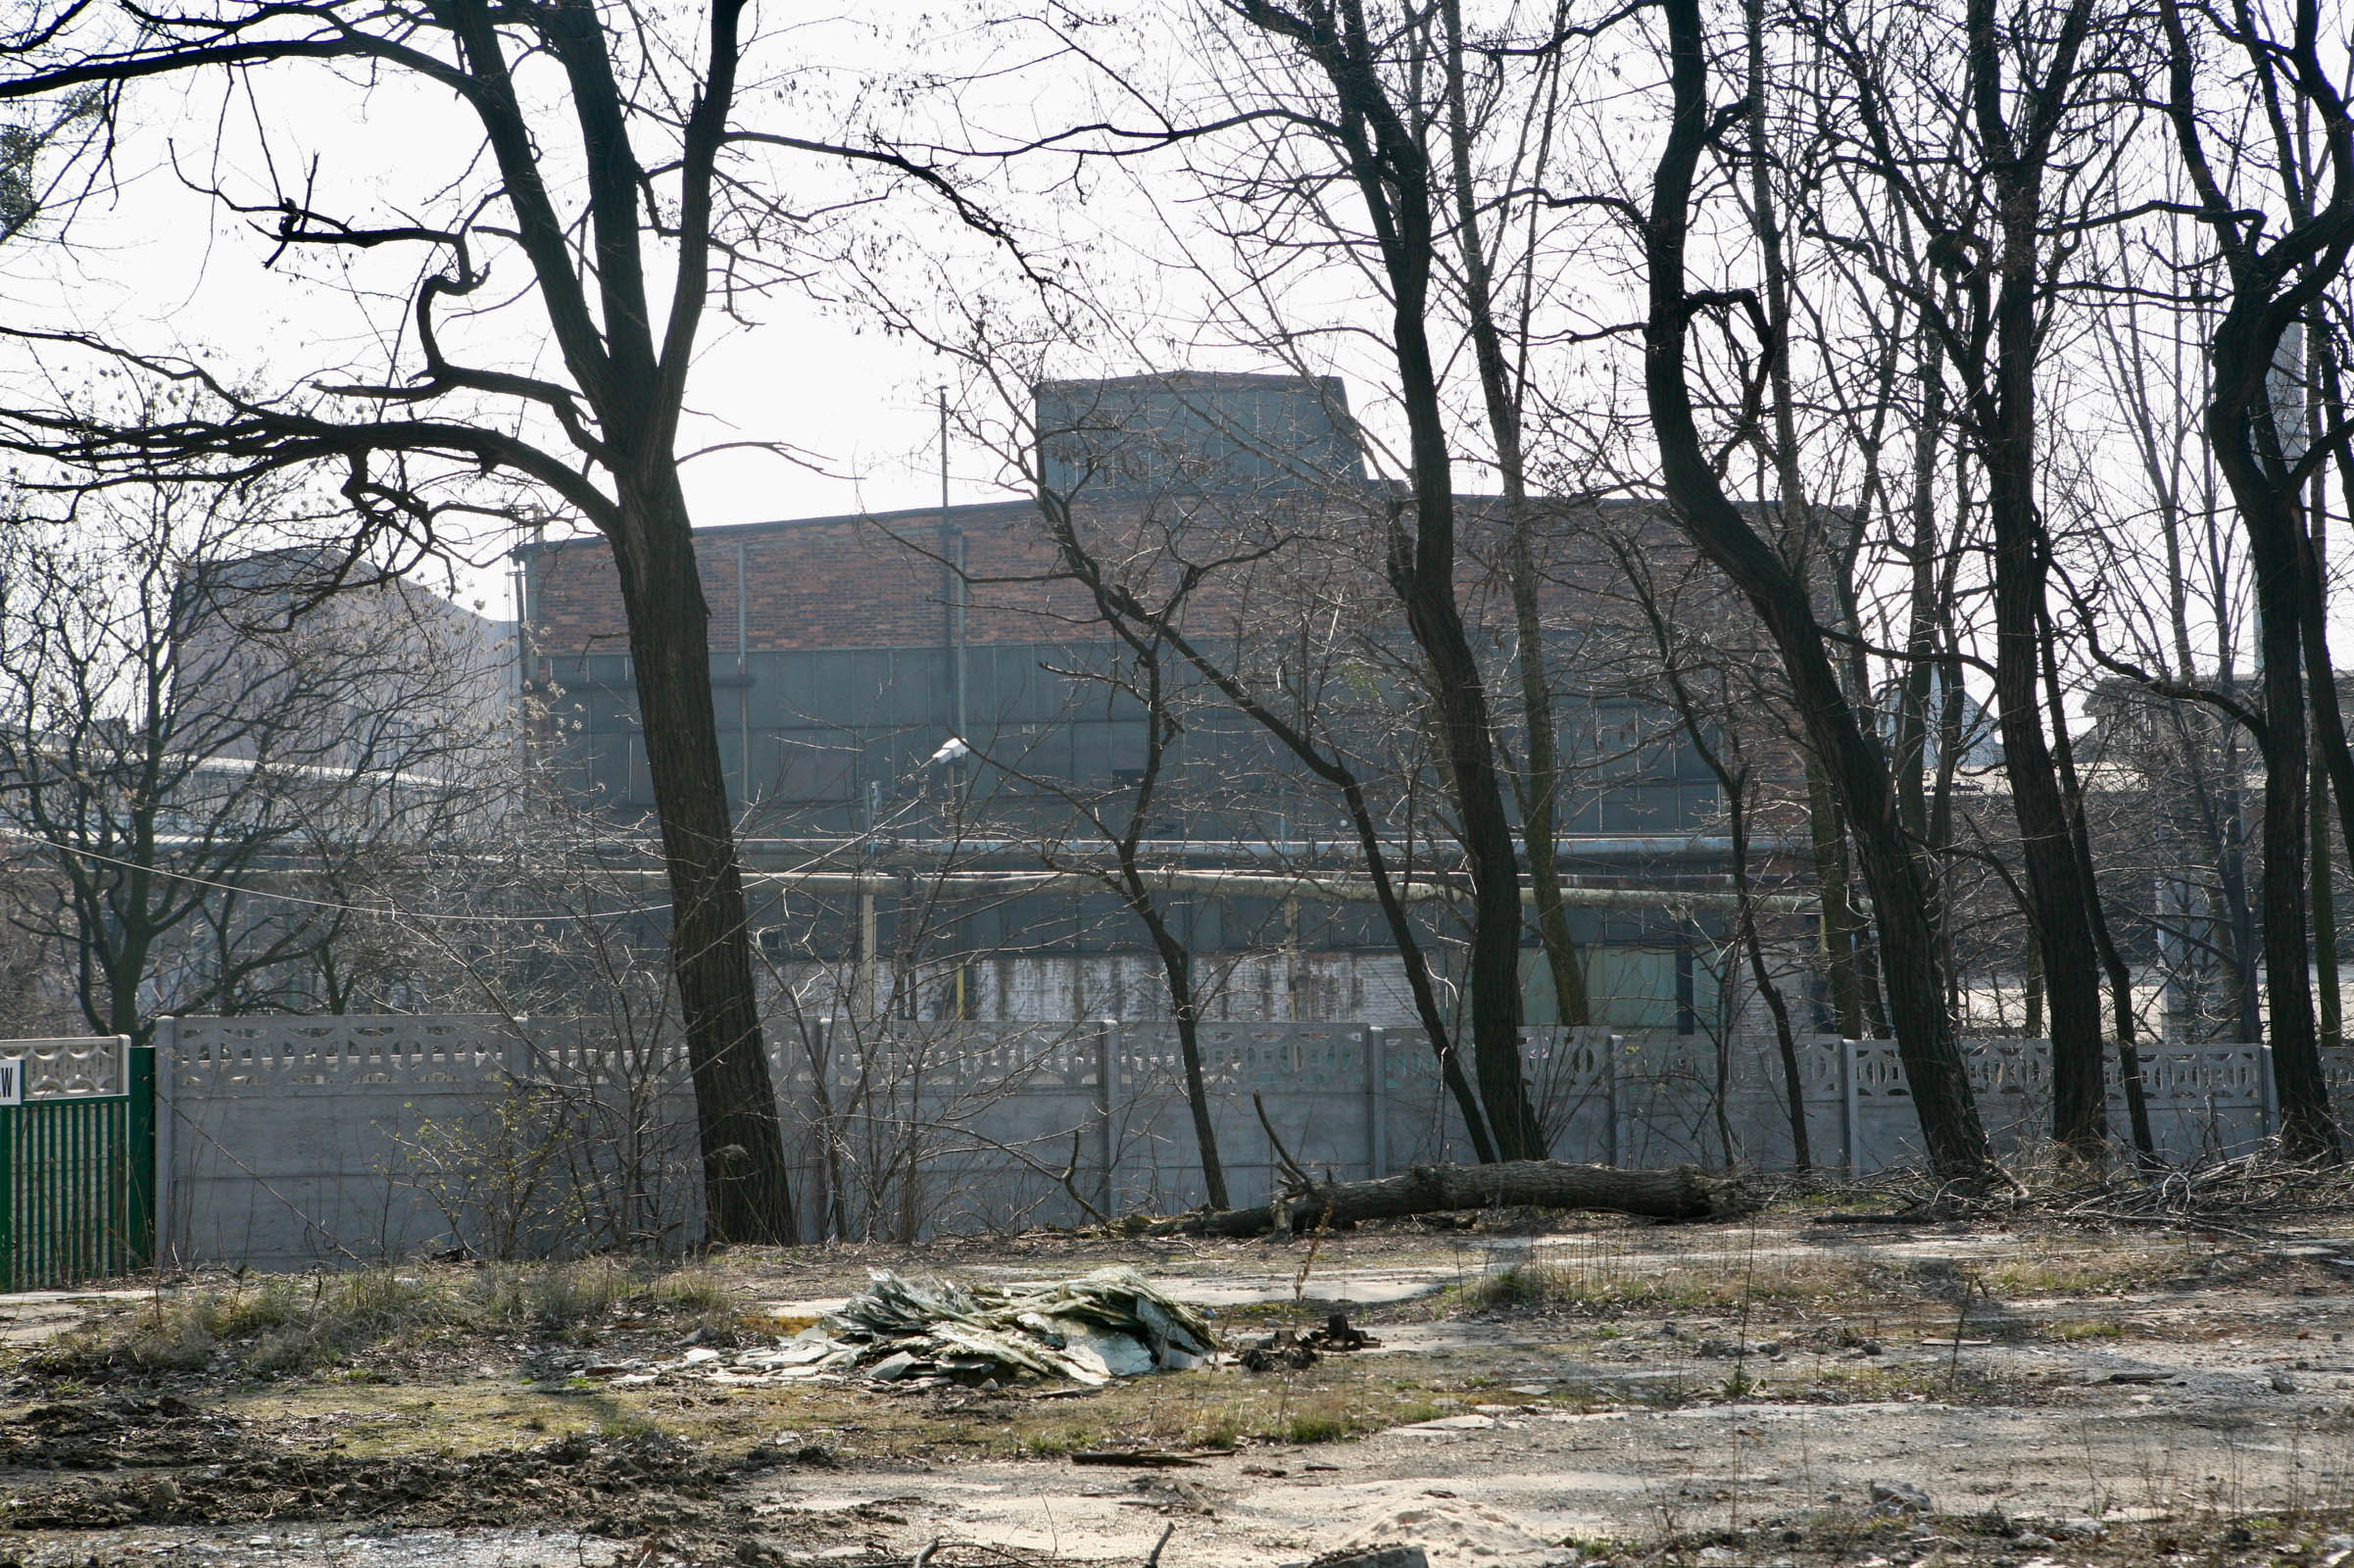 Zygmunt steel works. 2007 6665